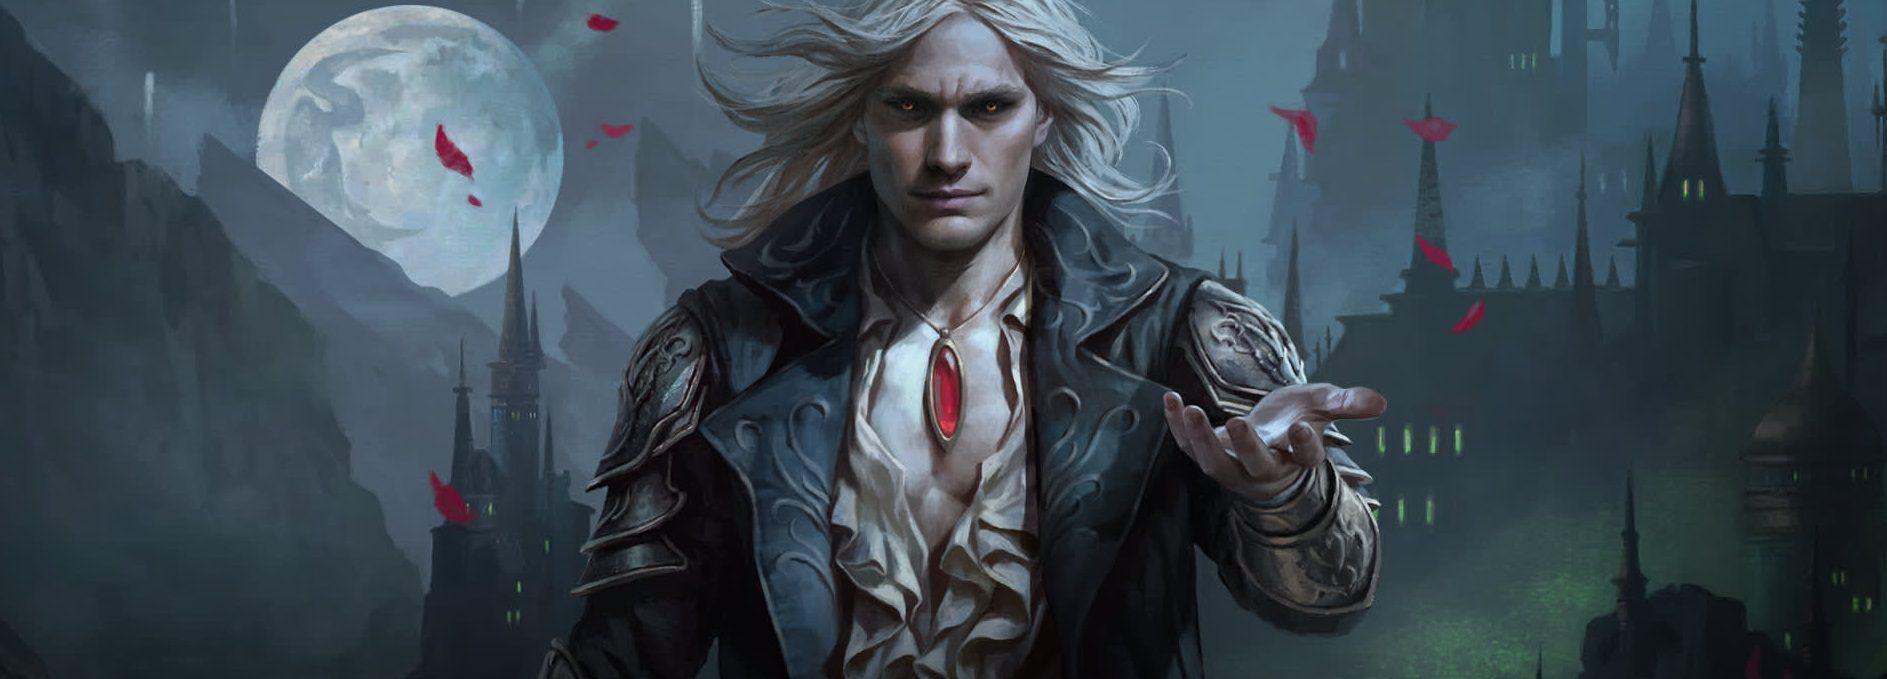 Magic: The Gathering's Crimson Vow set brings plenty of vampires with it